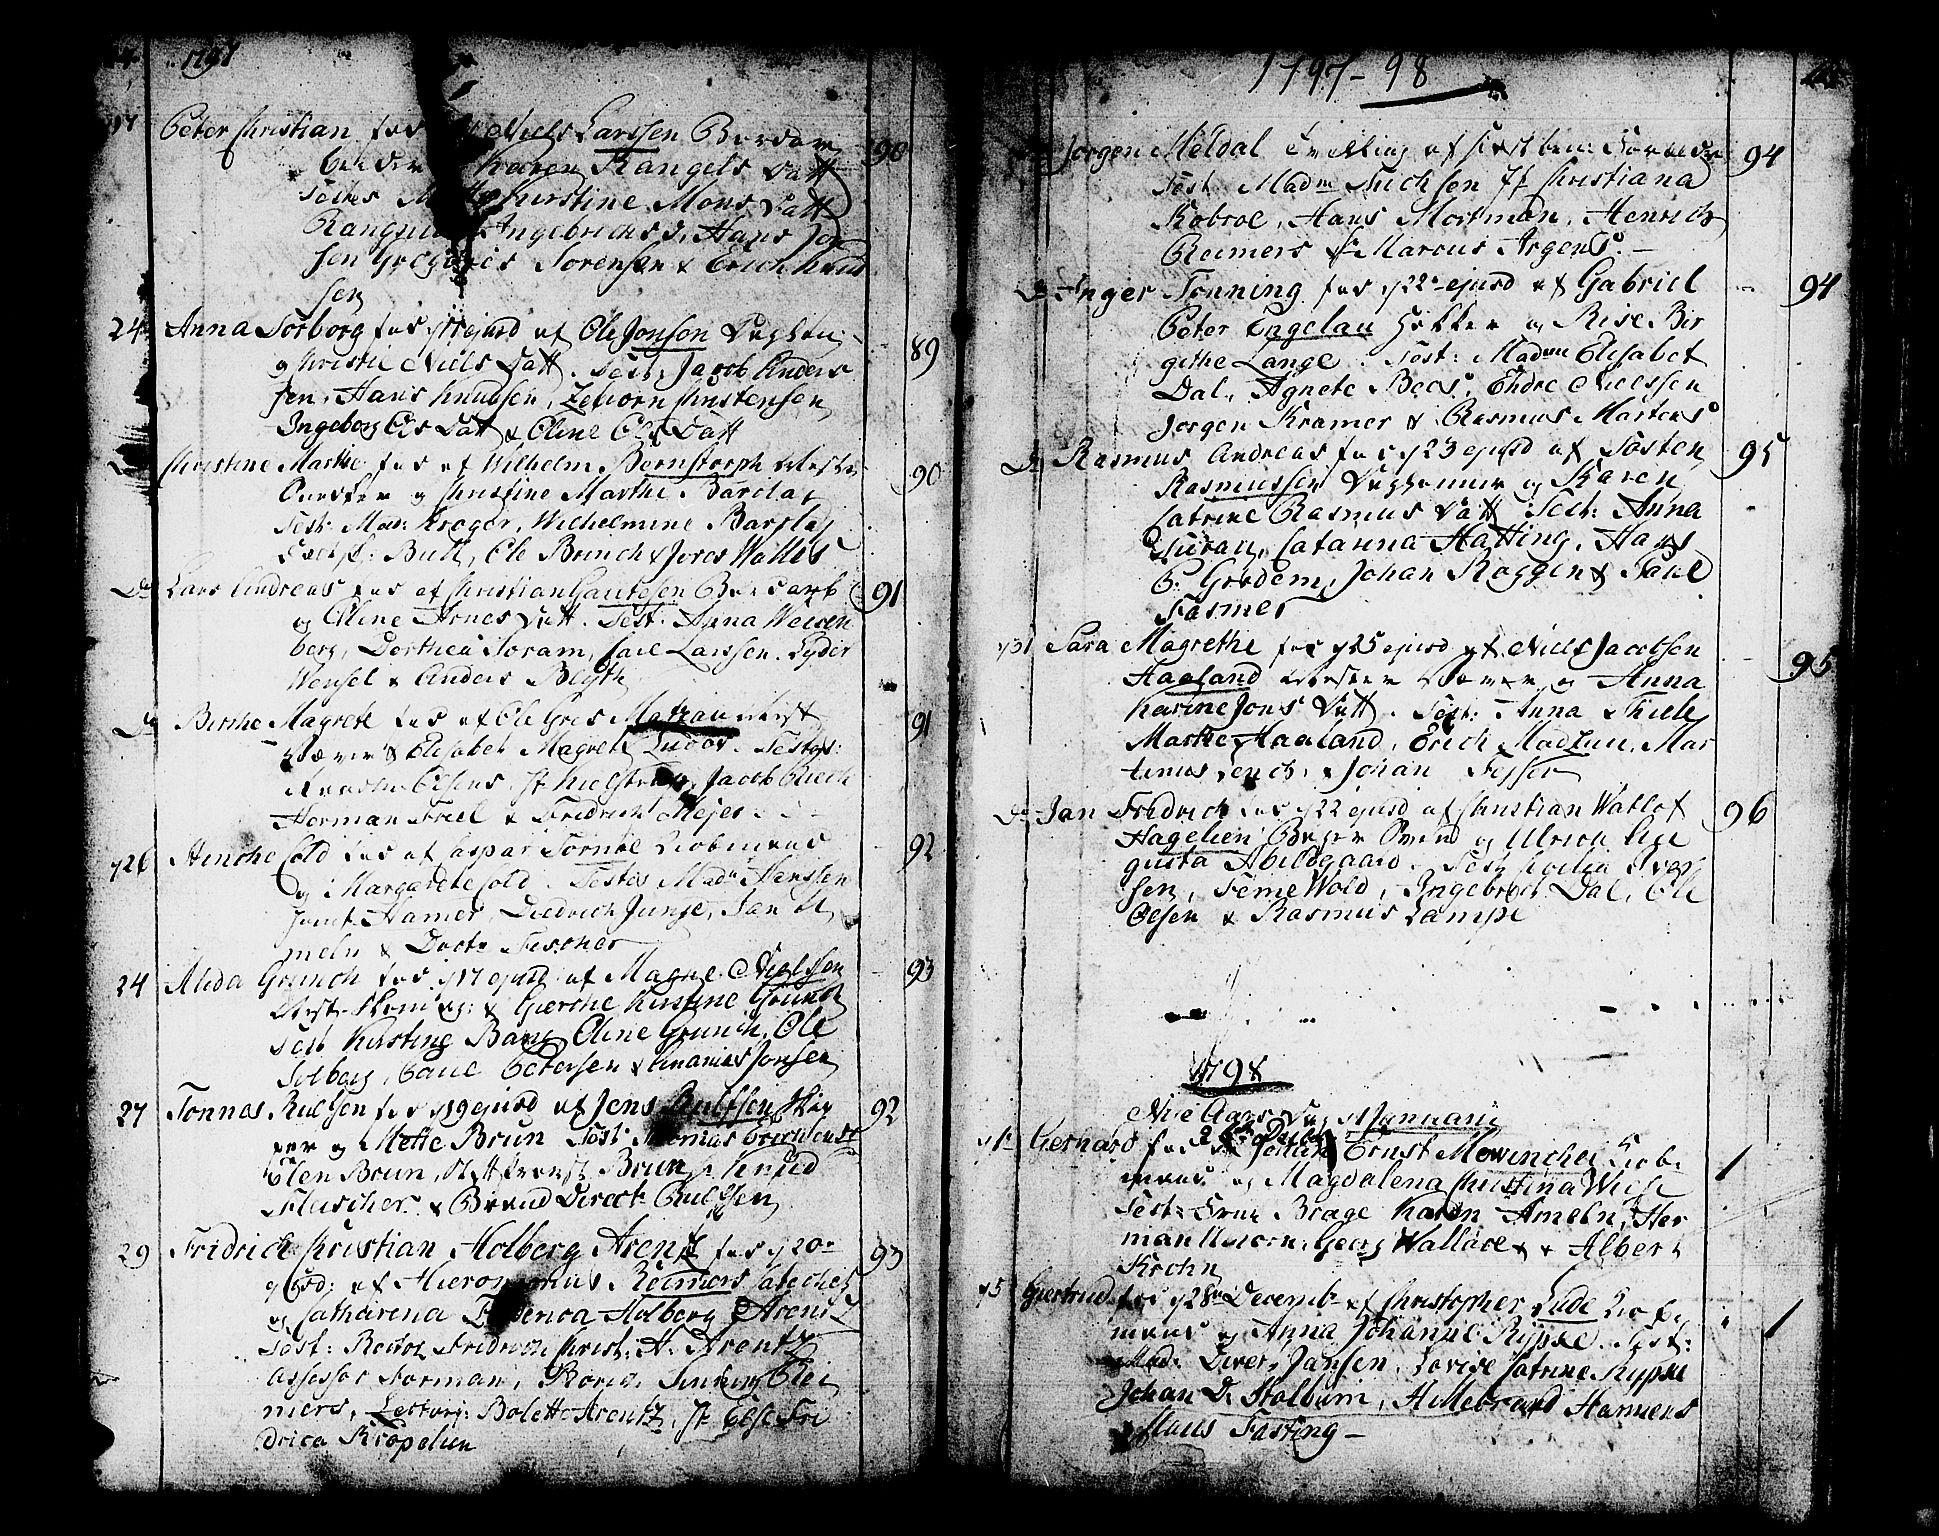 SAB, Domkirken sokneprestembete, H/Haa/L0004: Ministerialbok nr. A 4, 1763-1820, s. 164-165